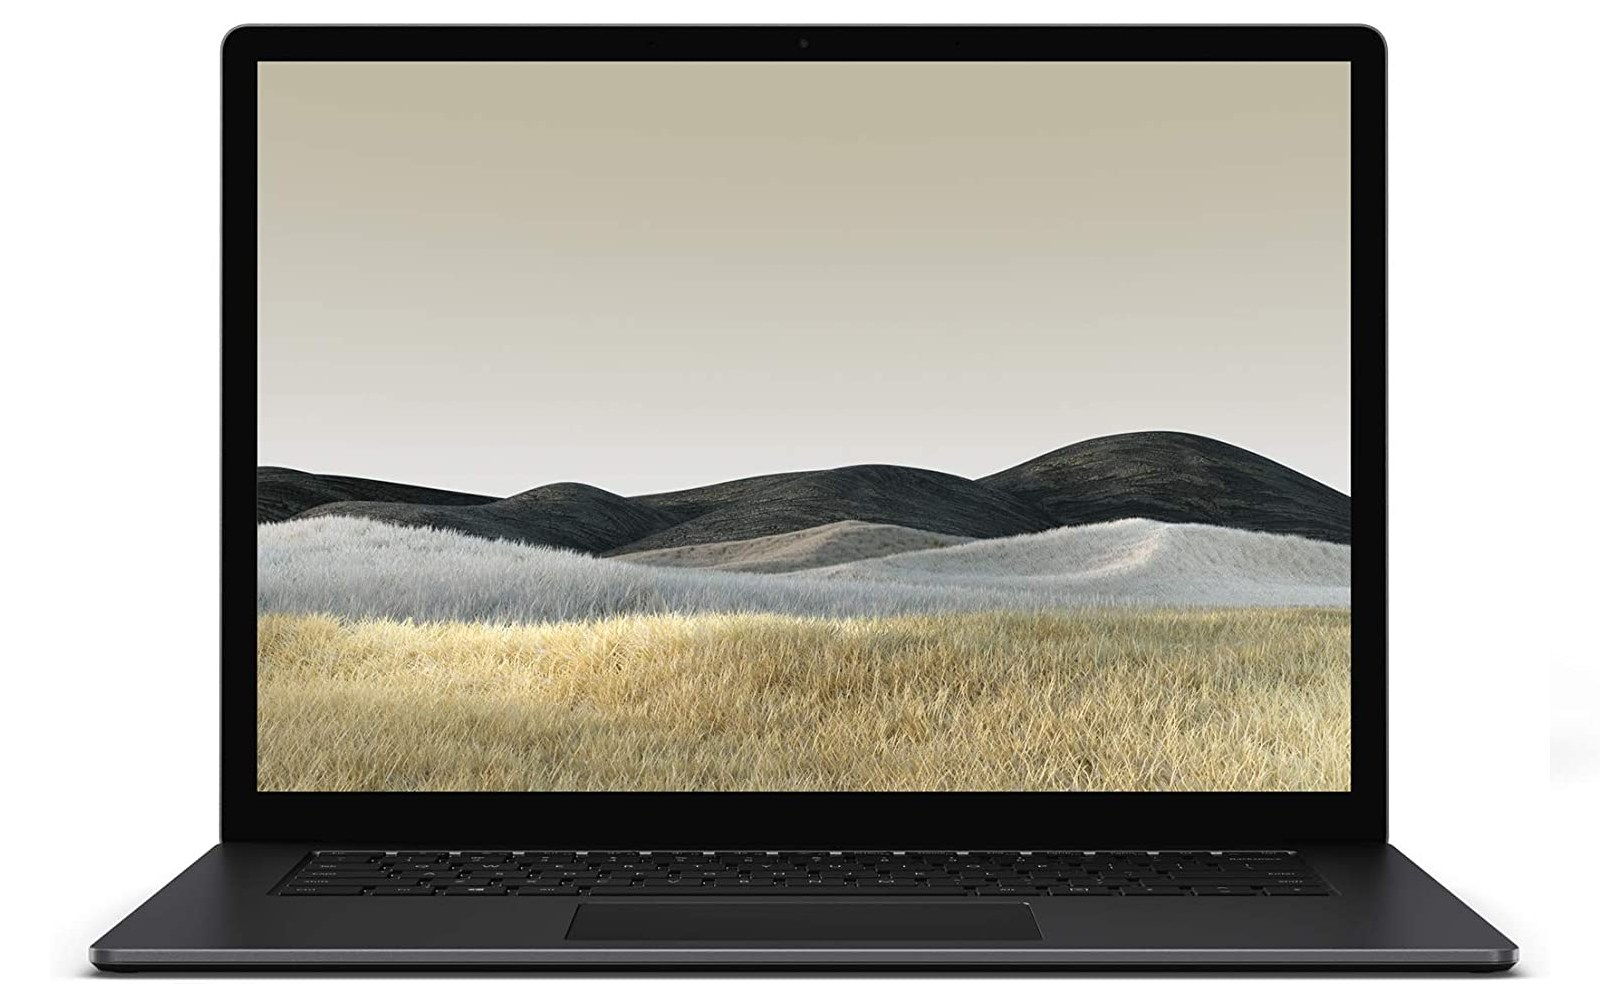 15 tuuman Microsoft Surface Laptop 4. Kuva: WinFuture.de.